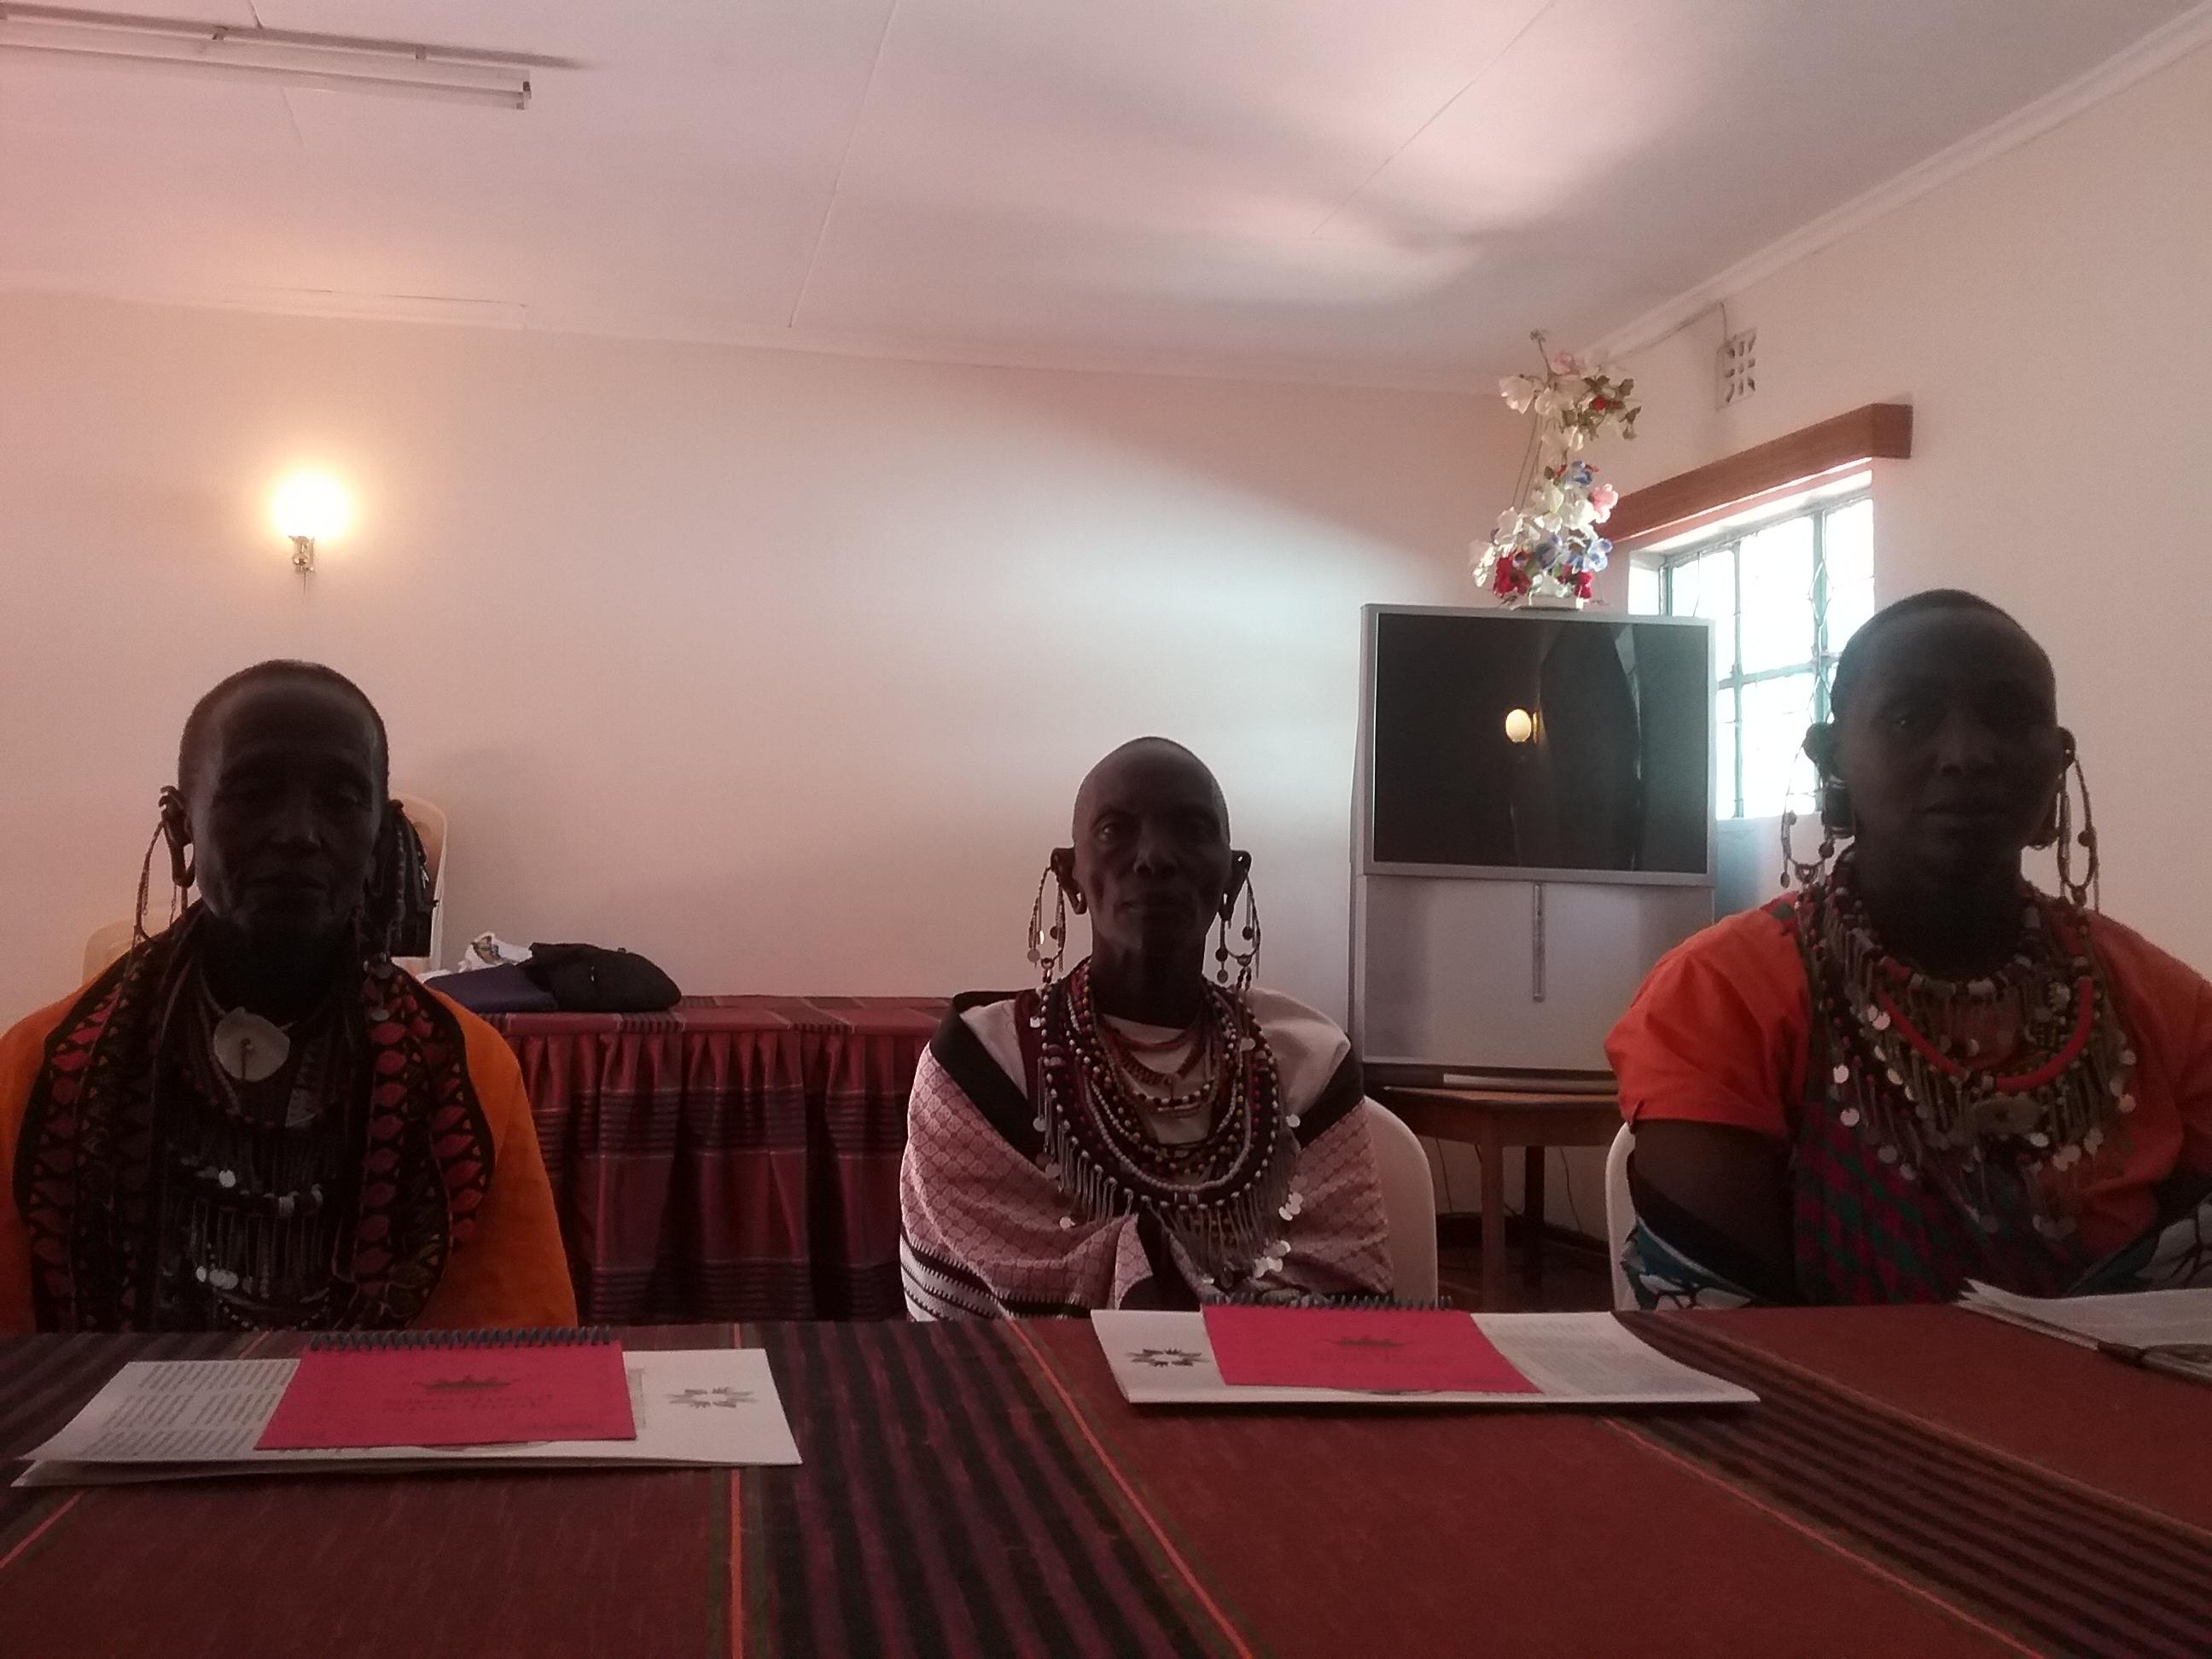 http://indigenouswomen-africa.org/wp-content/uploads/2018/01/WOMEN-1.jpg